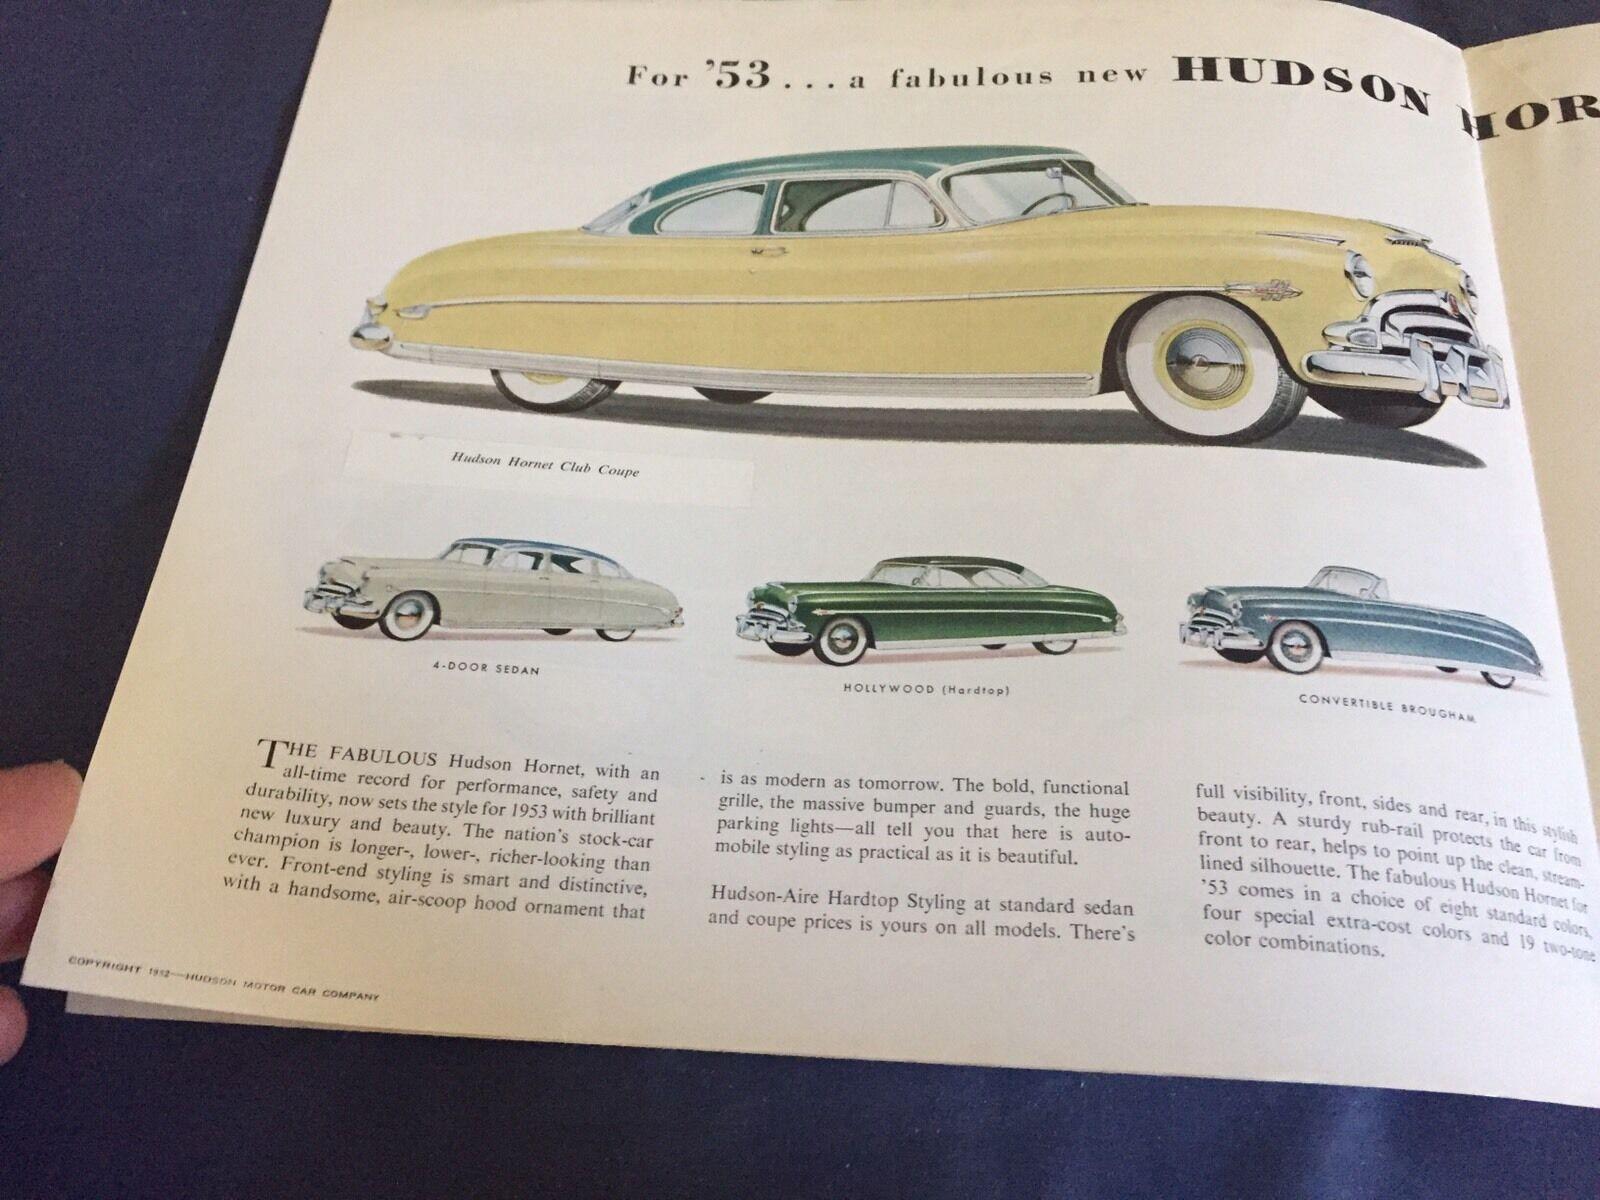 1953 HUDSON HORNET Super Wasp And Wasp Pacemaker Color Brochure